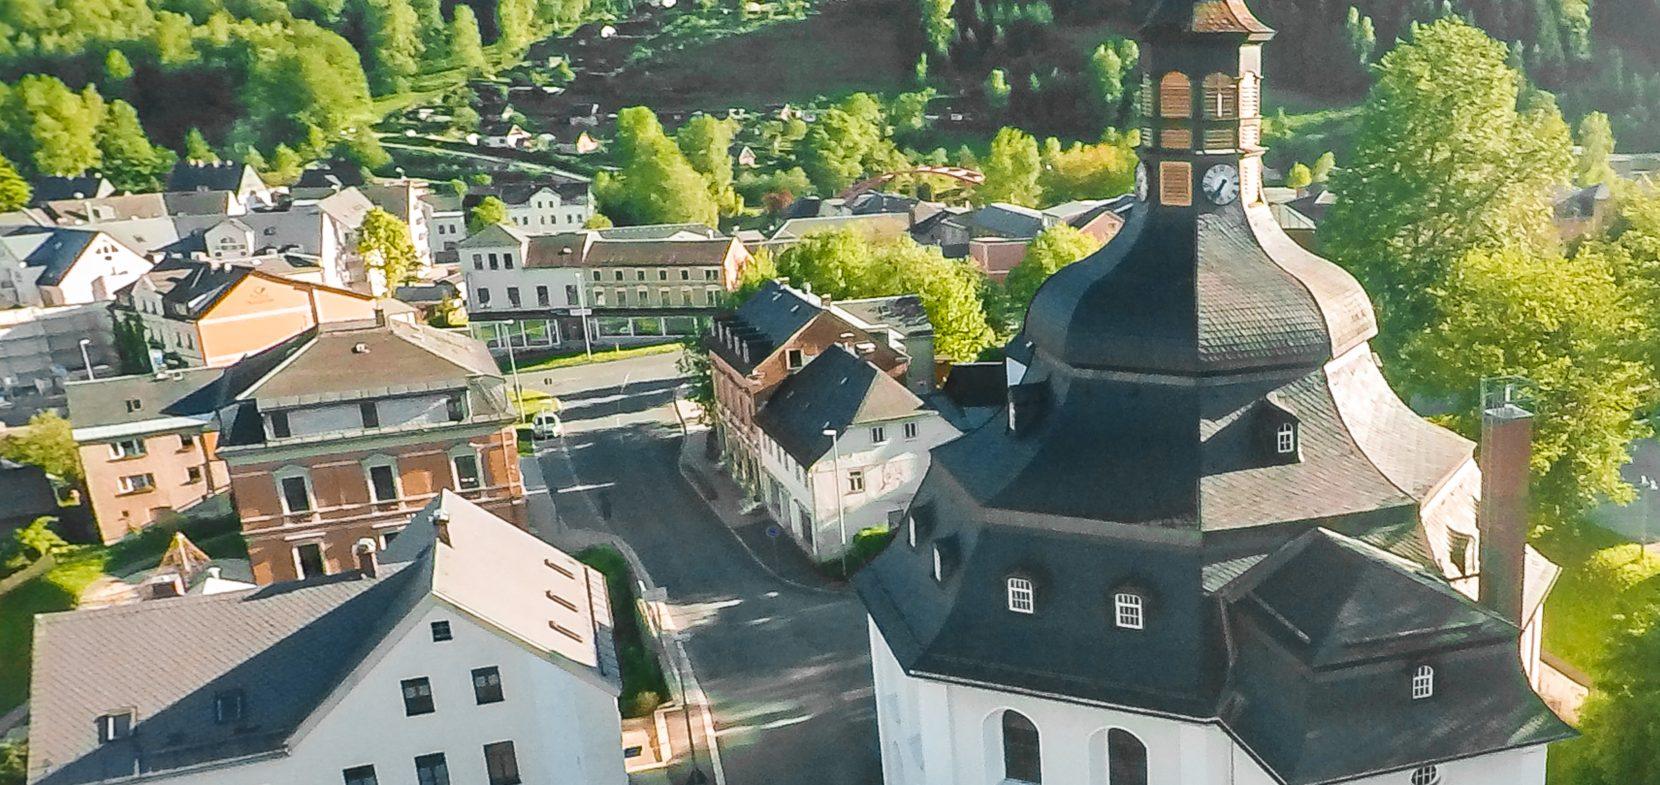 Ev.-Luth. Kirchgemeinde Klingenthal